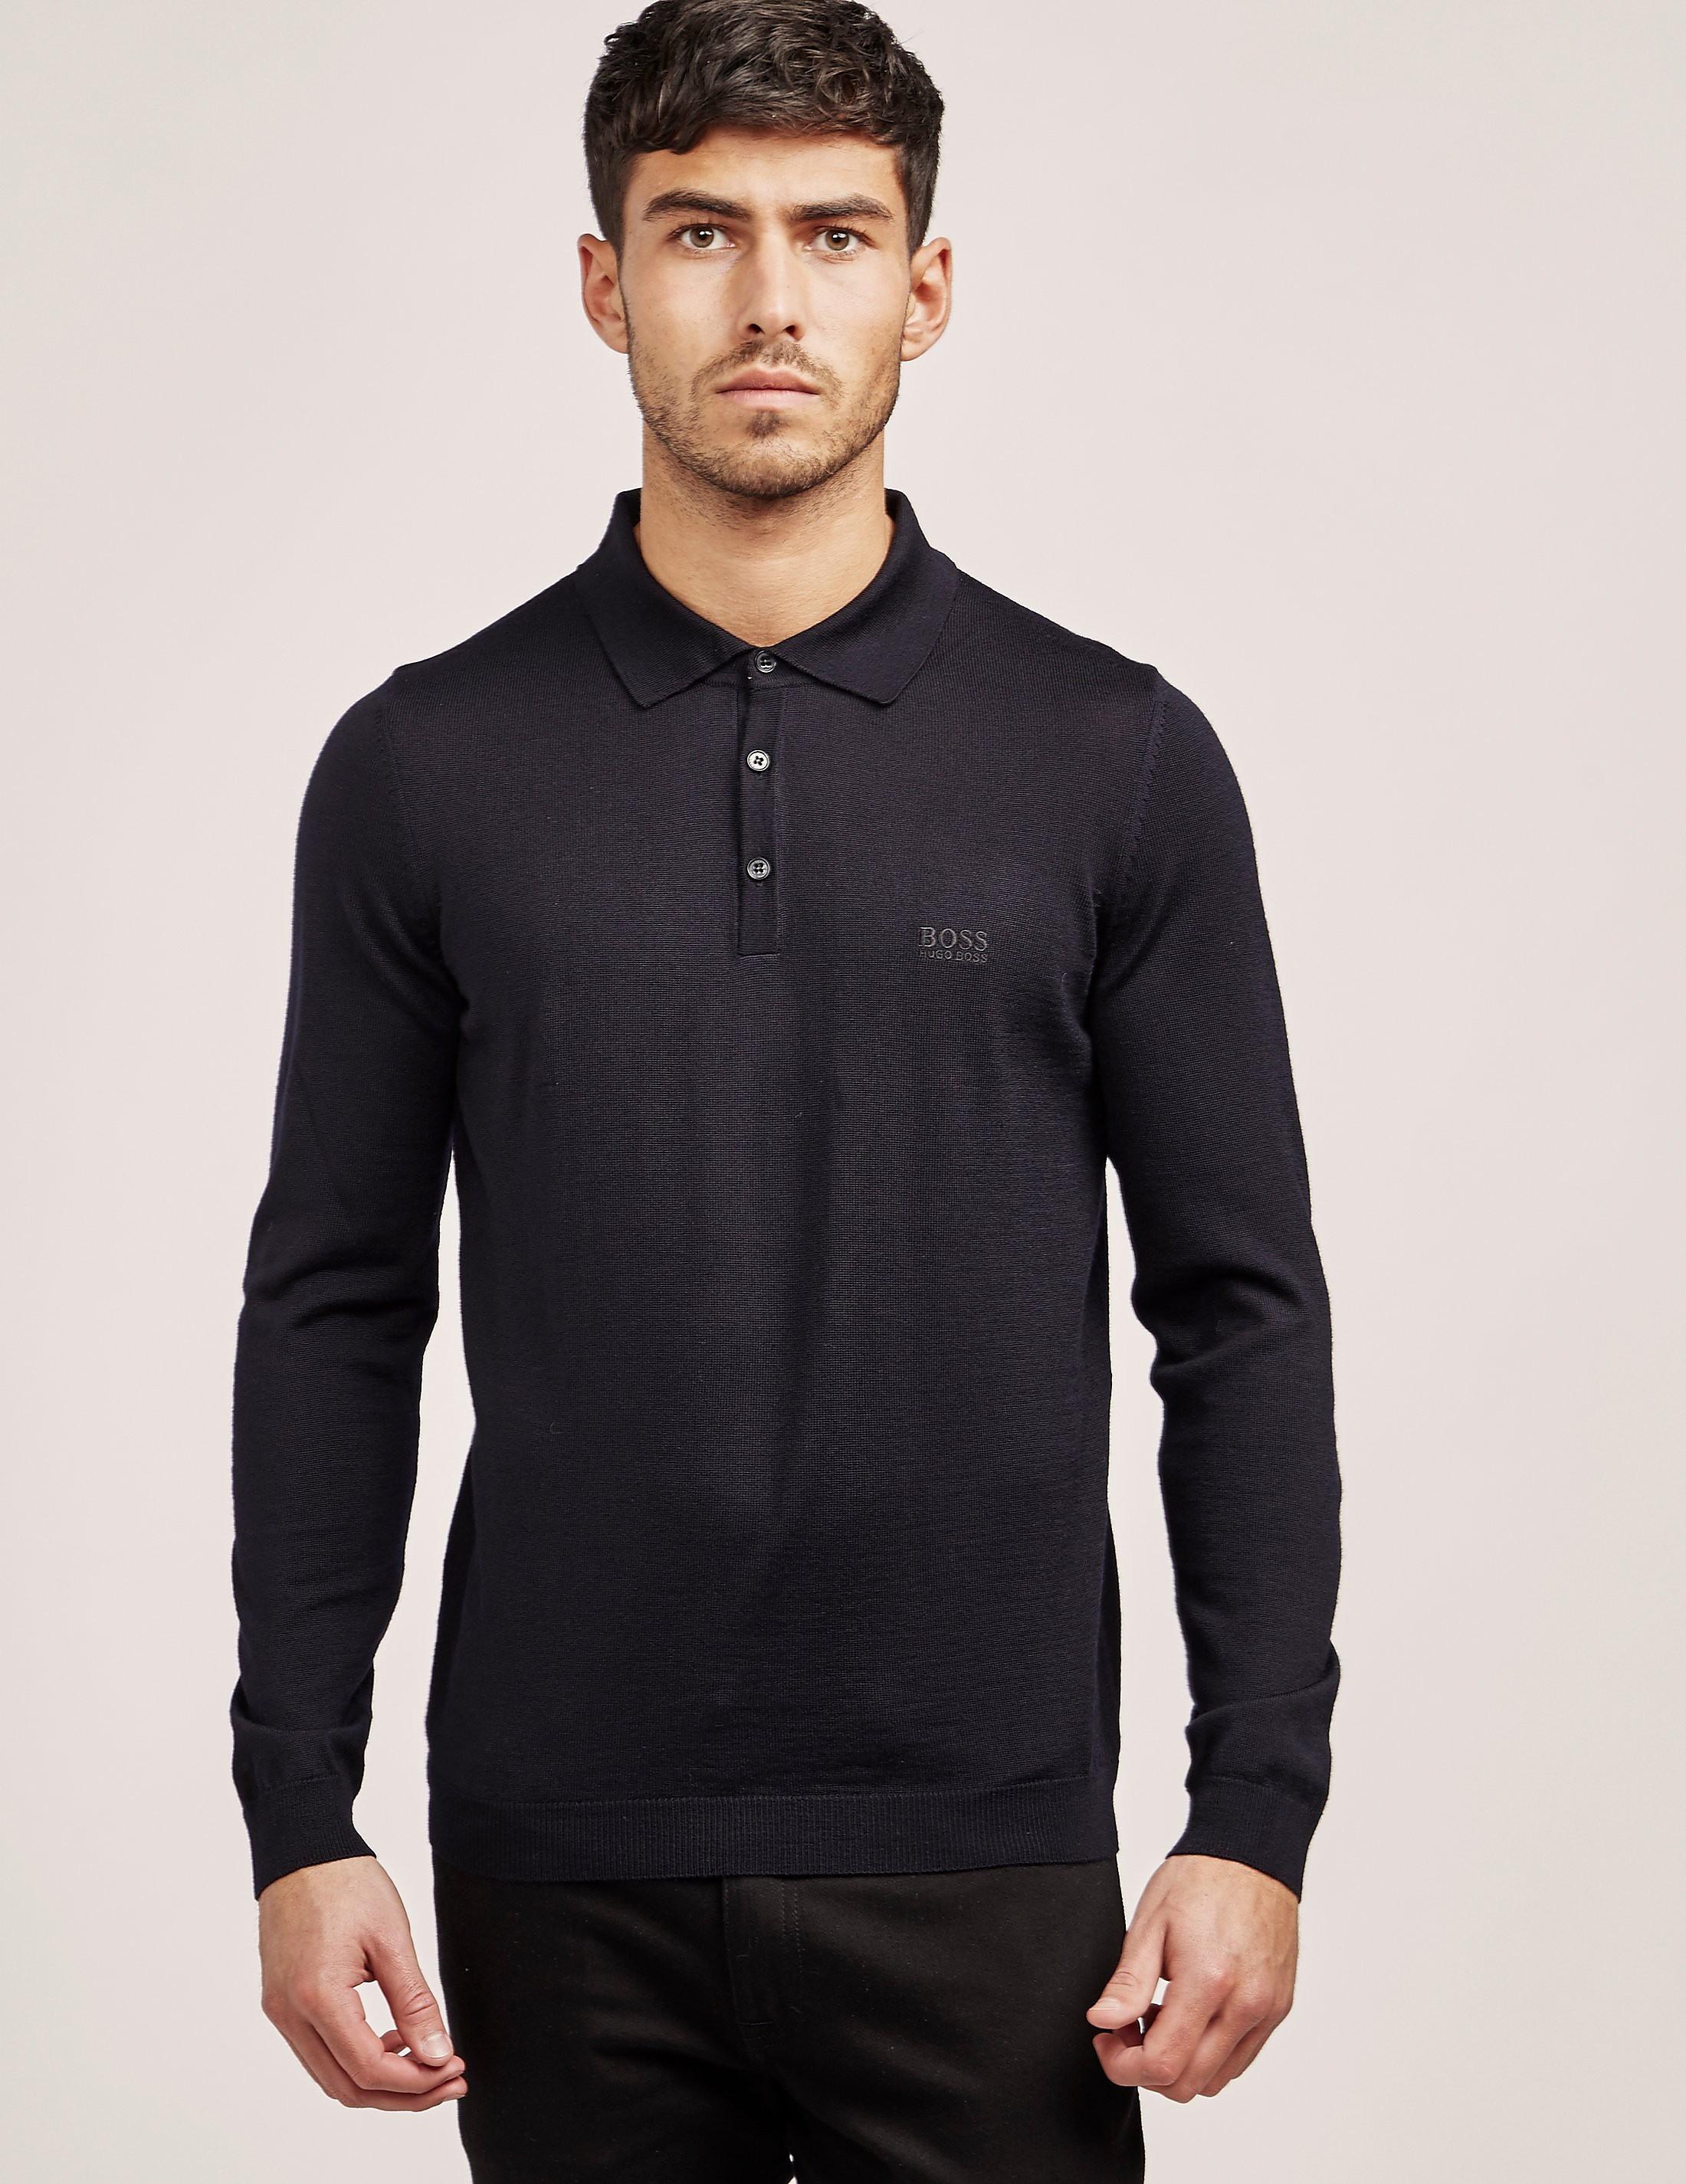 BOSS Green Knitted Long Sleeve Polo Shirt